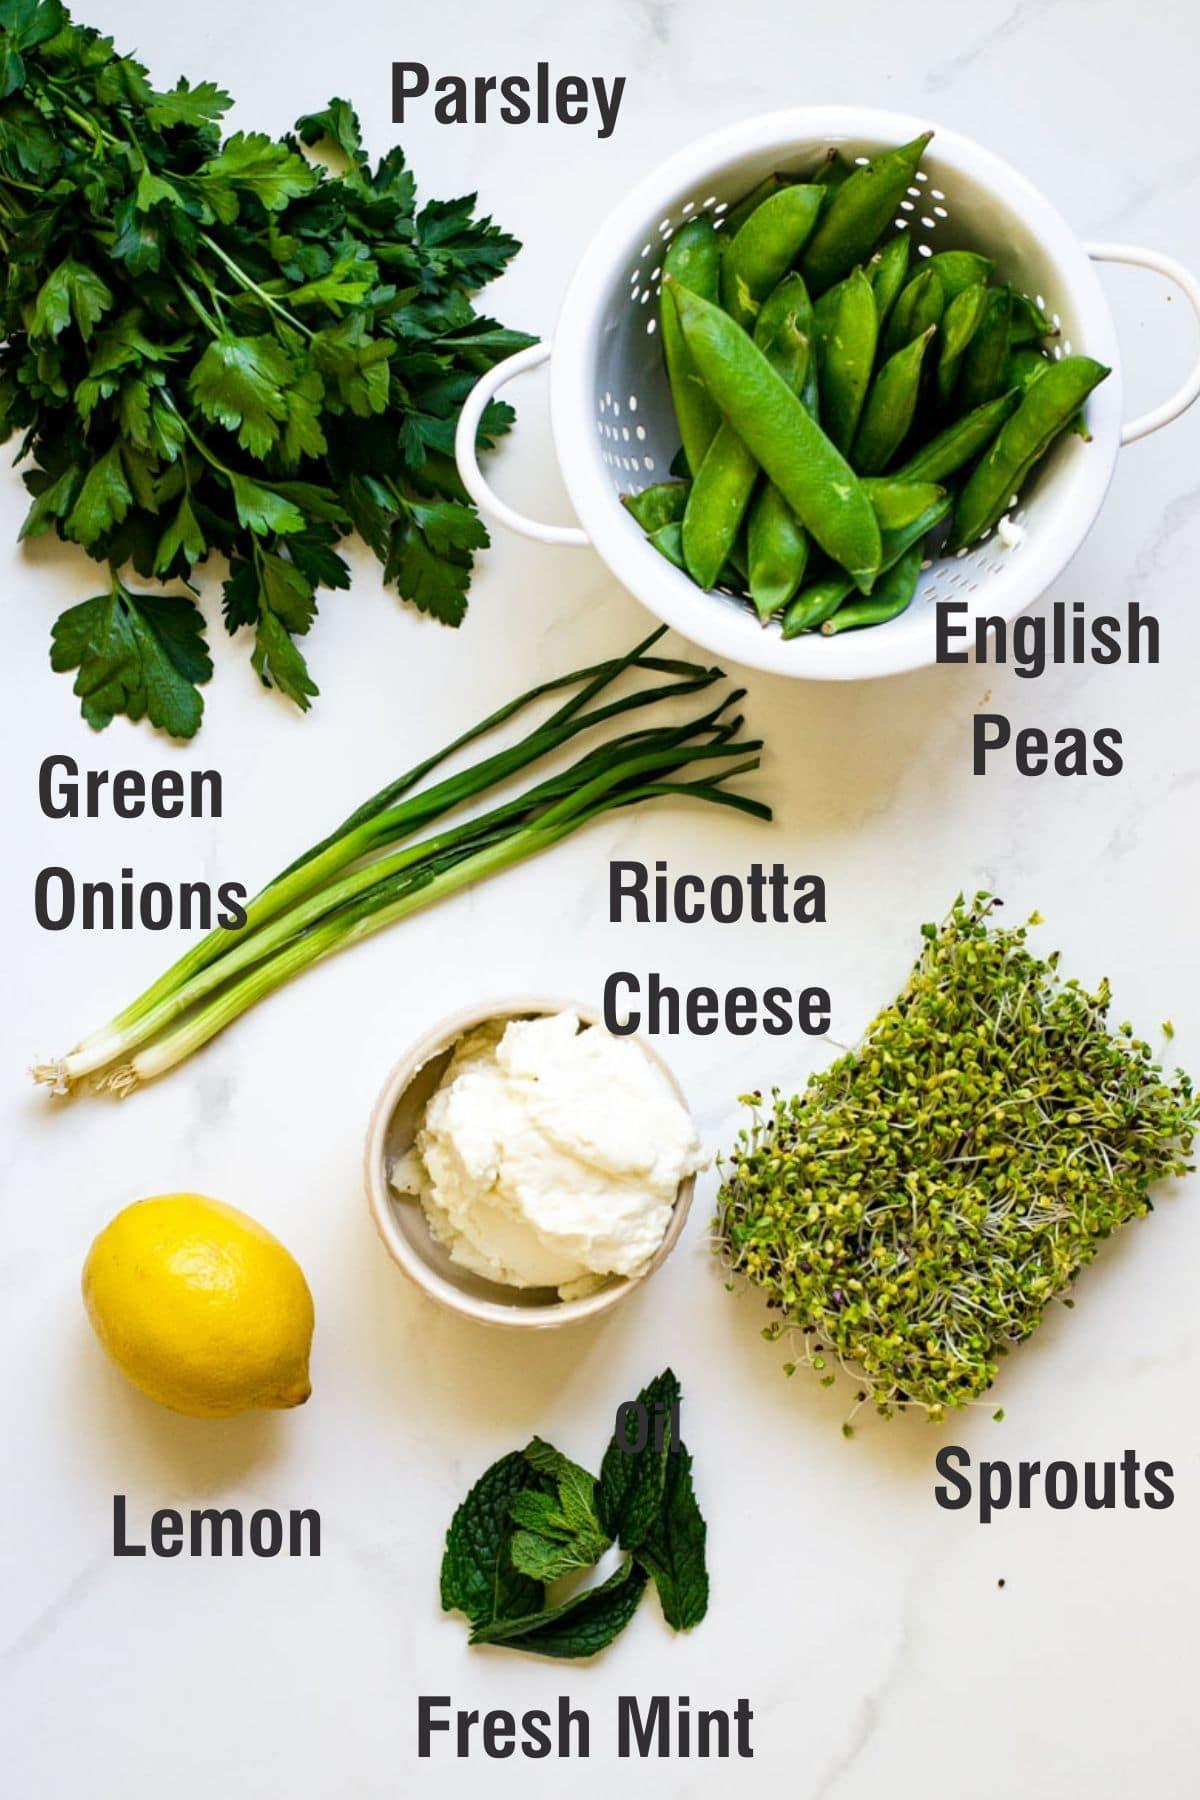 Ingredients for making english pea salad.